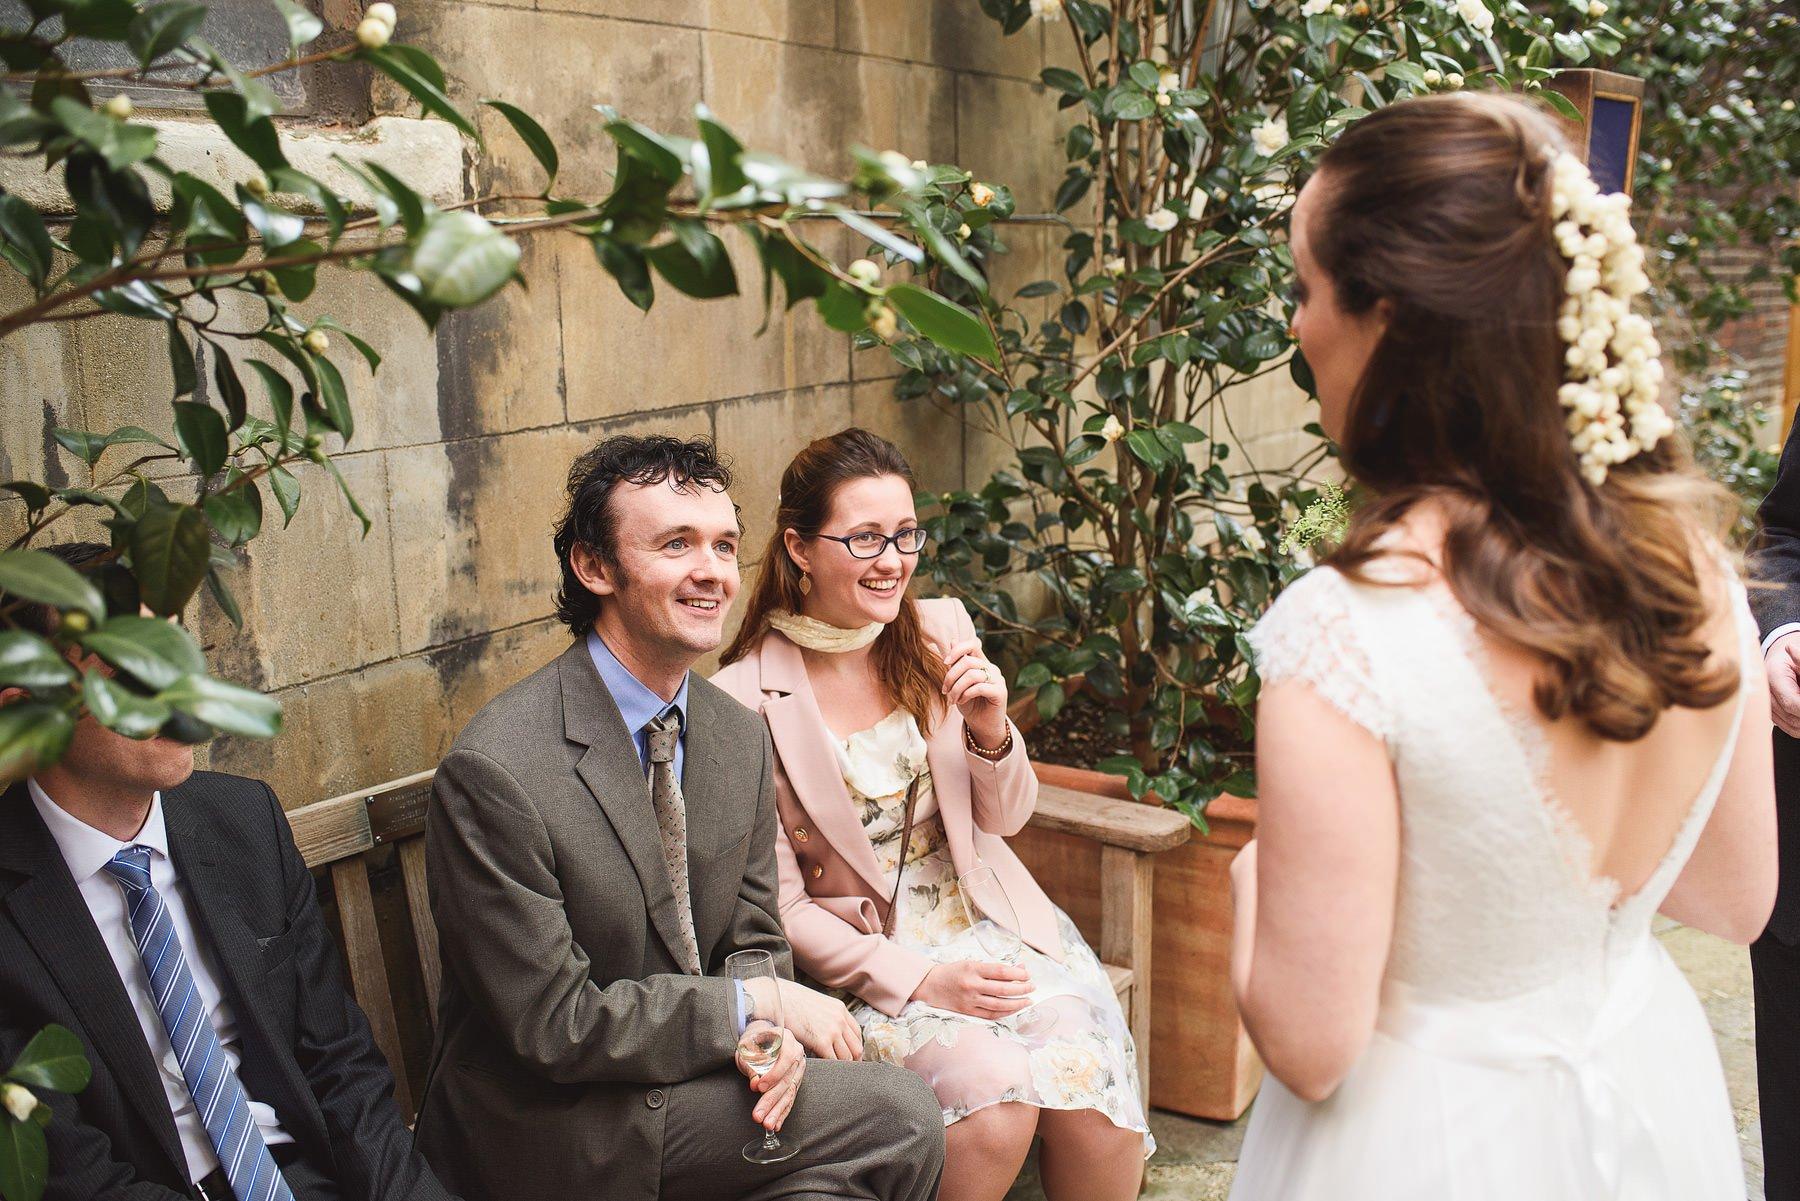 wedding photographers stationers hall